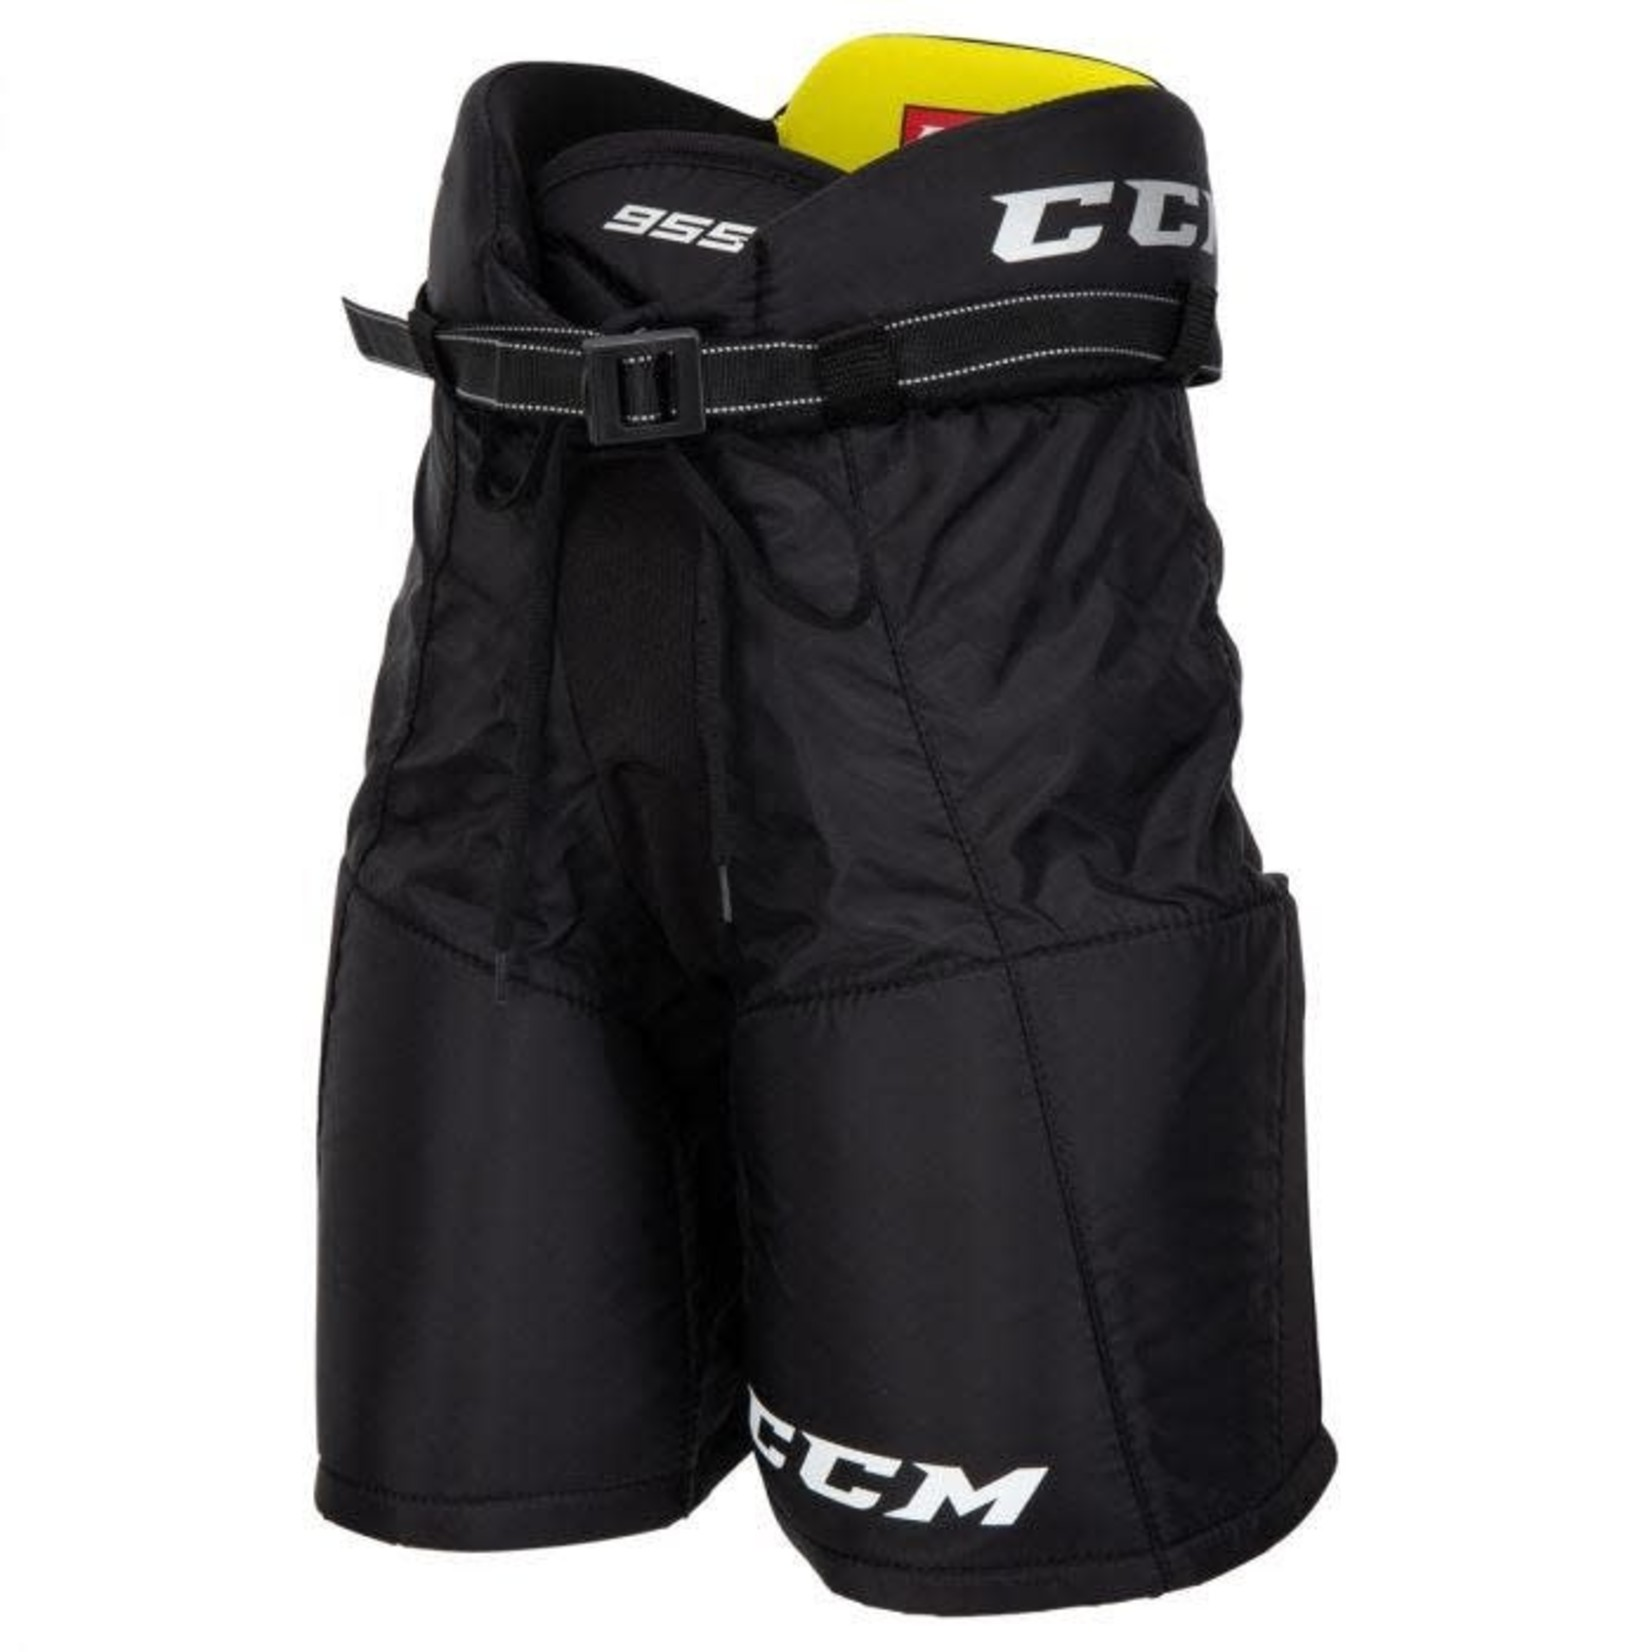 CCM CCM Hockey Pants, Tacks 9550, Youth